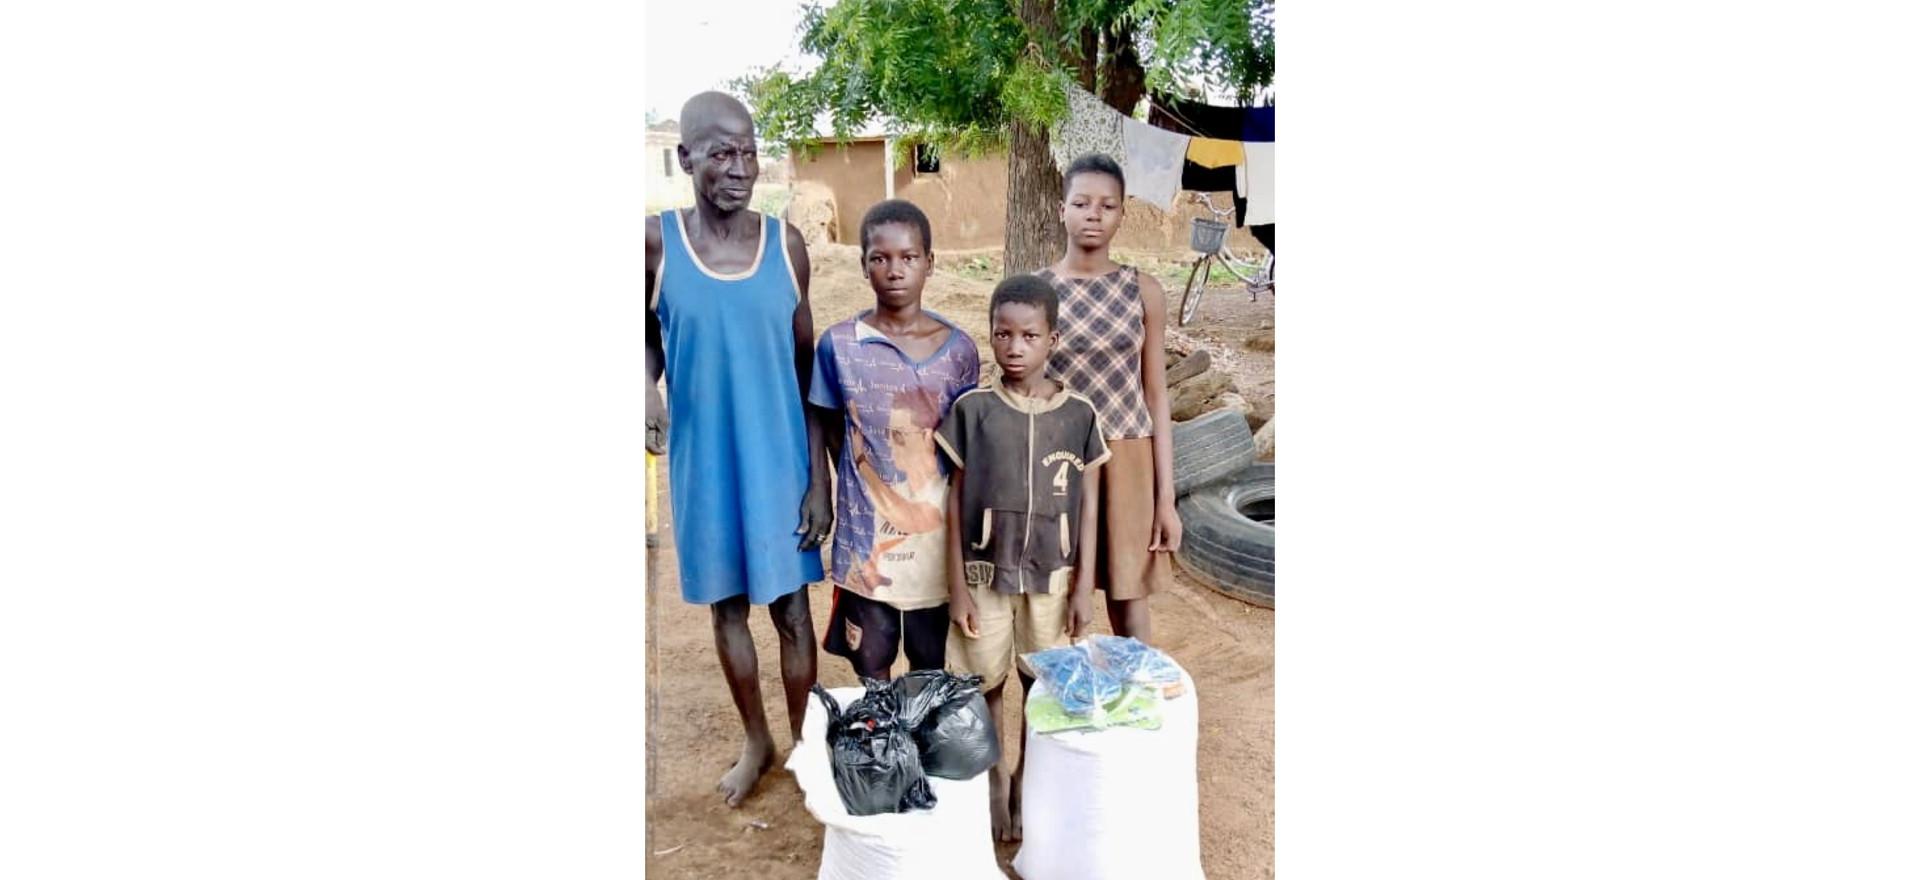 Apisikaap and children